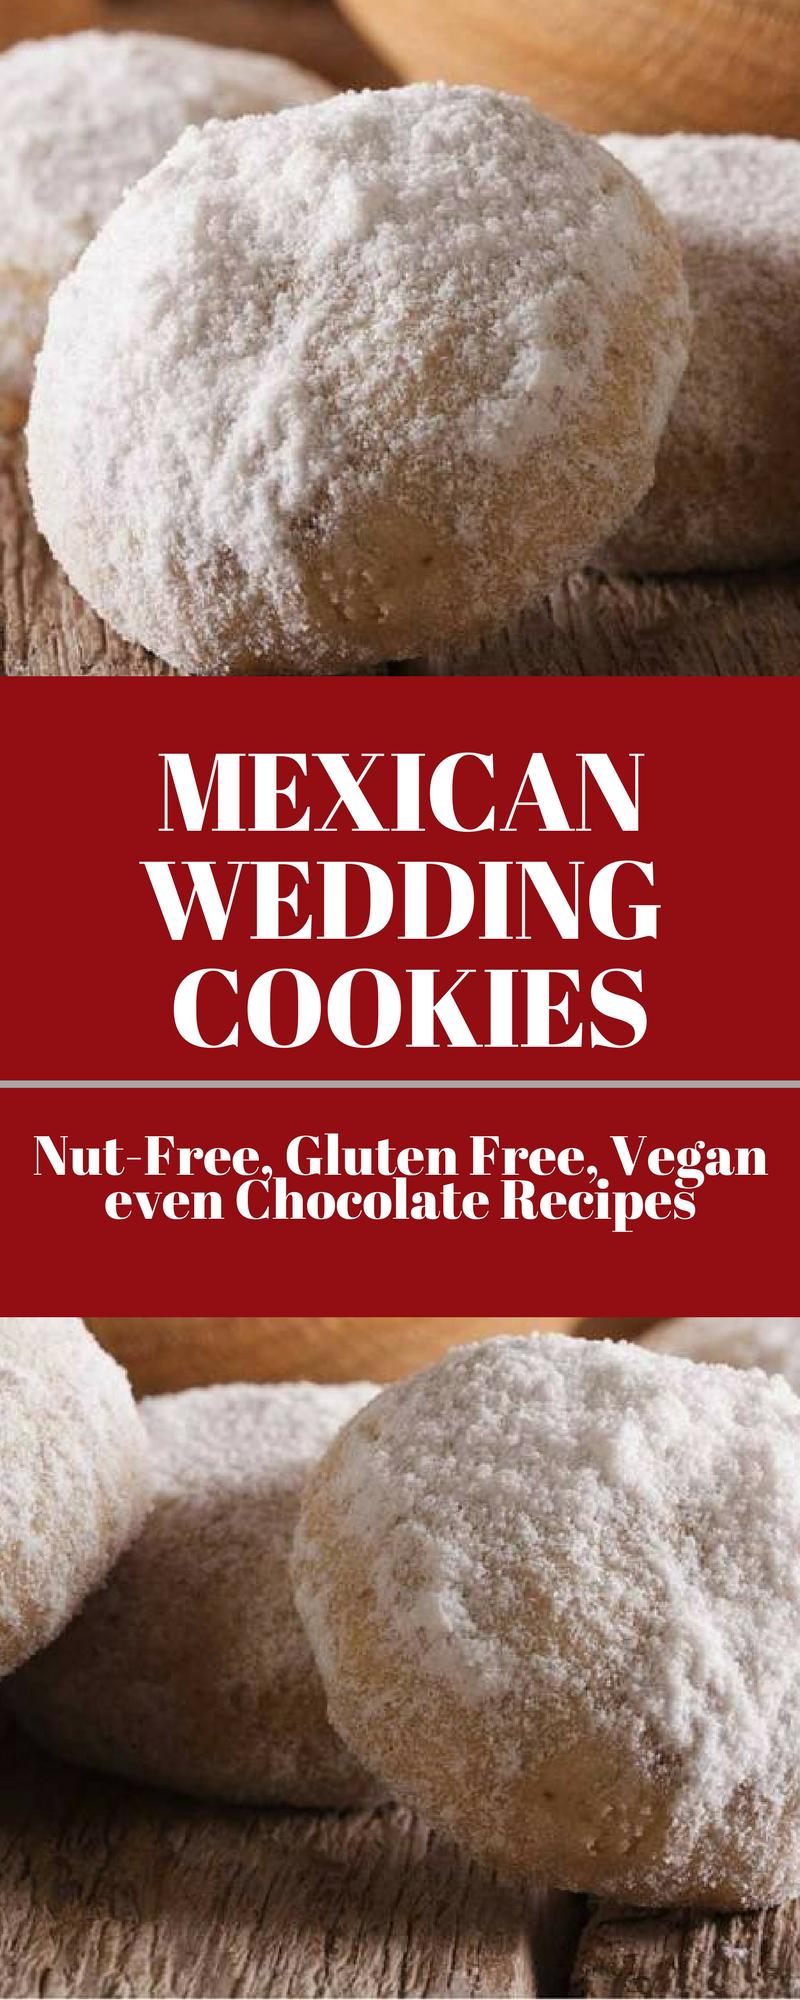 Mexican Wedding Cookies Nut Free Gluten Vegan Even Chocolate Recipes